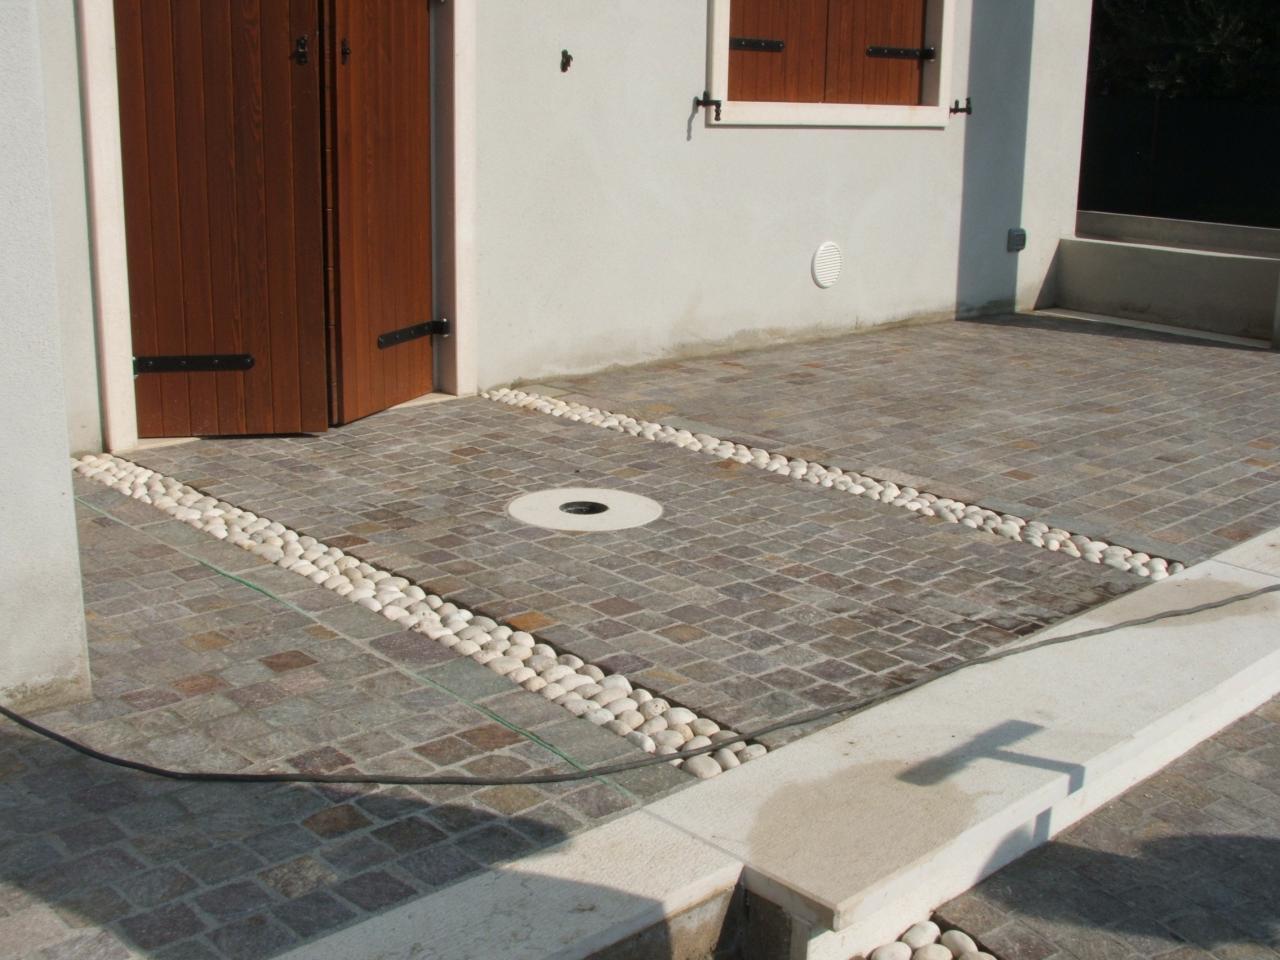 Pavimento Esterno Pietra : Pavimento esterno in pietra porfido e ciottolo verona fratelli